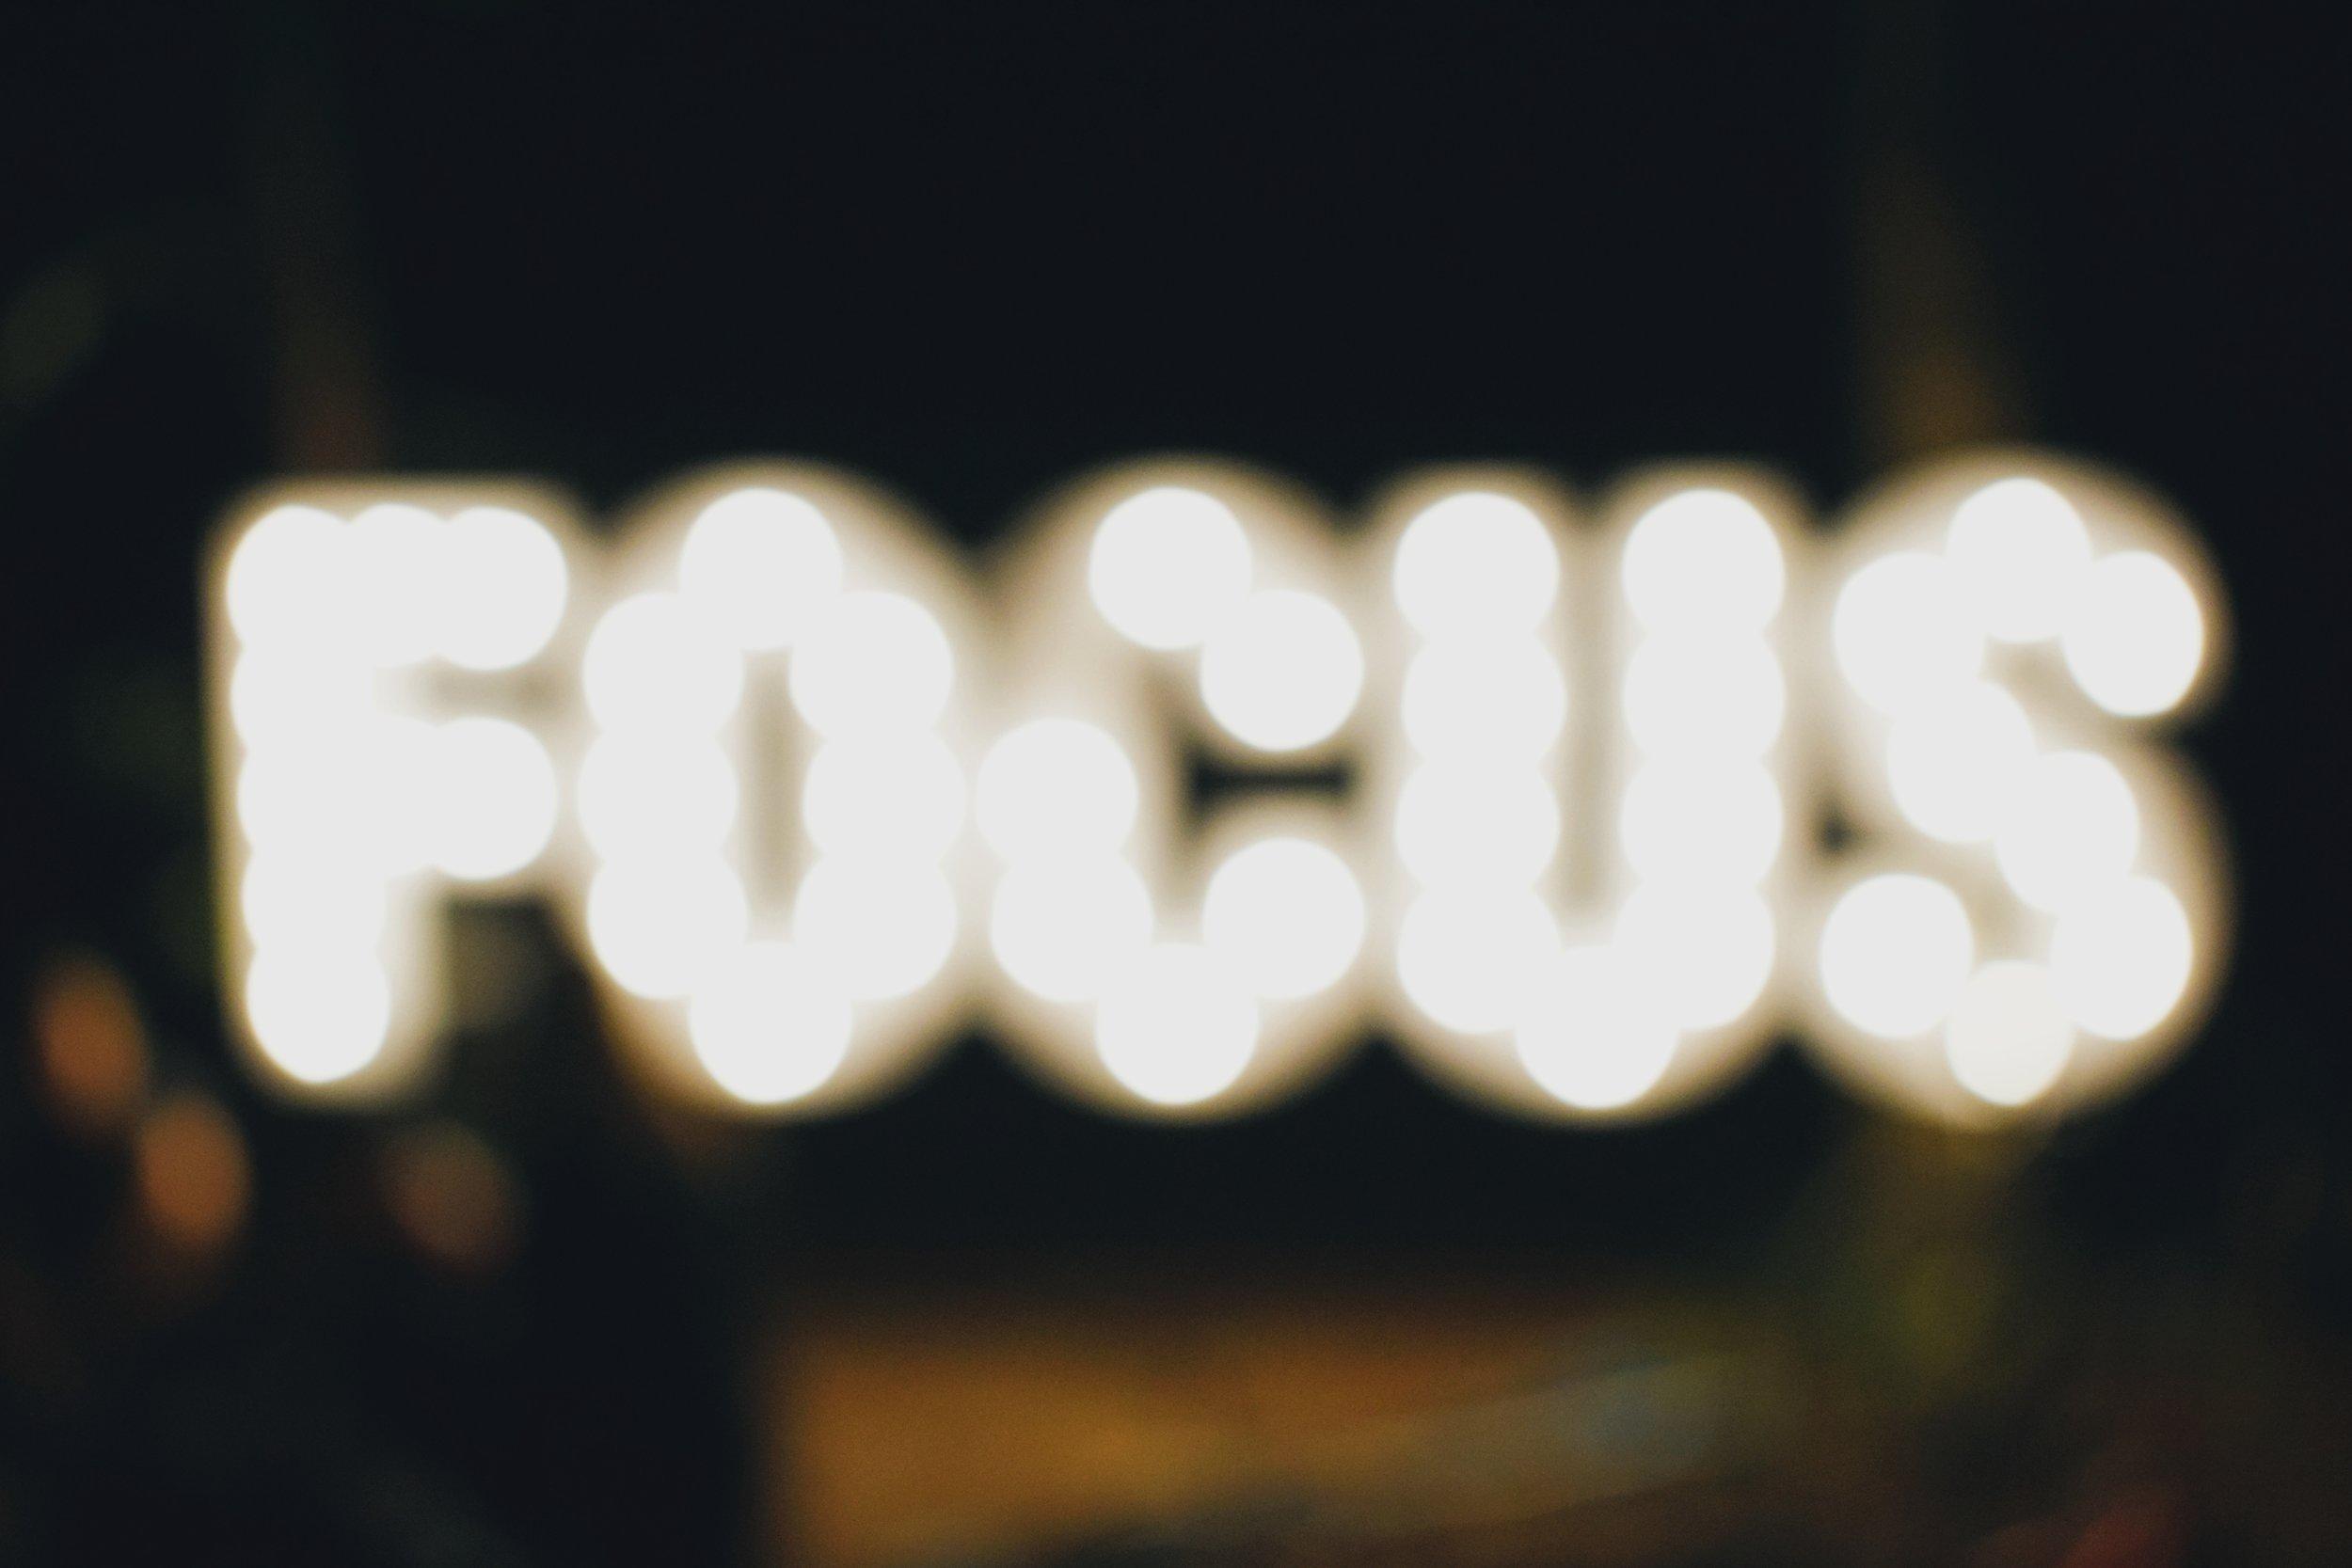 stayingfocusedduringtheholidays-motivatedduringtheholidays-focusedatwork.jpg